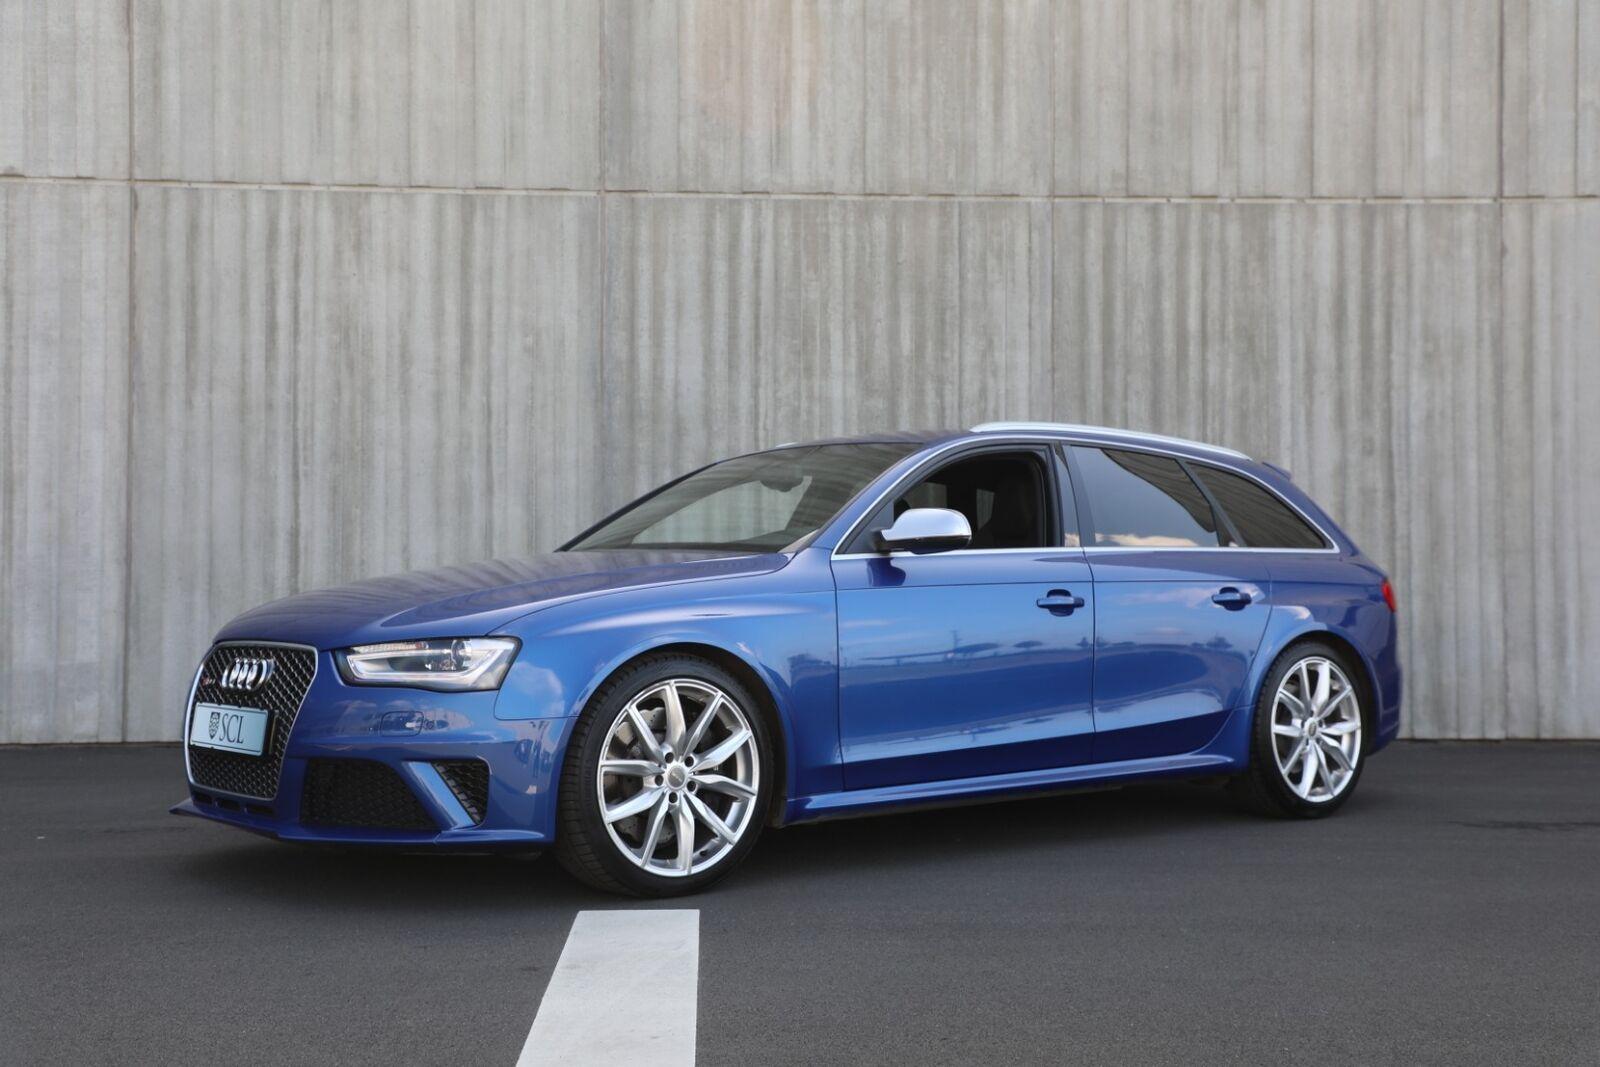 Audi RS4 4,2 FSi Avant quattro S-tr. 5d - 4.796 kr.